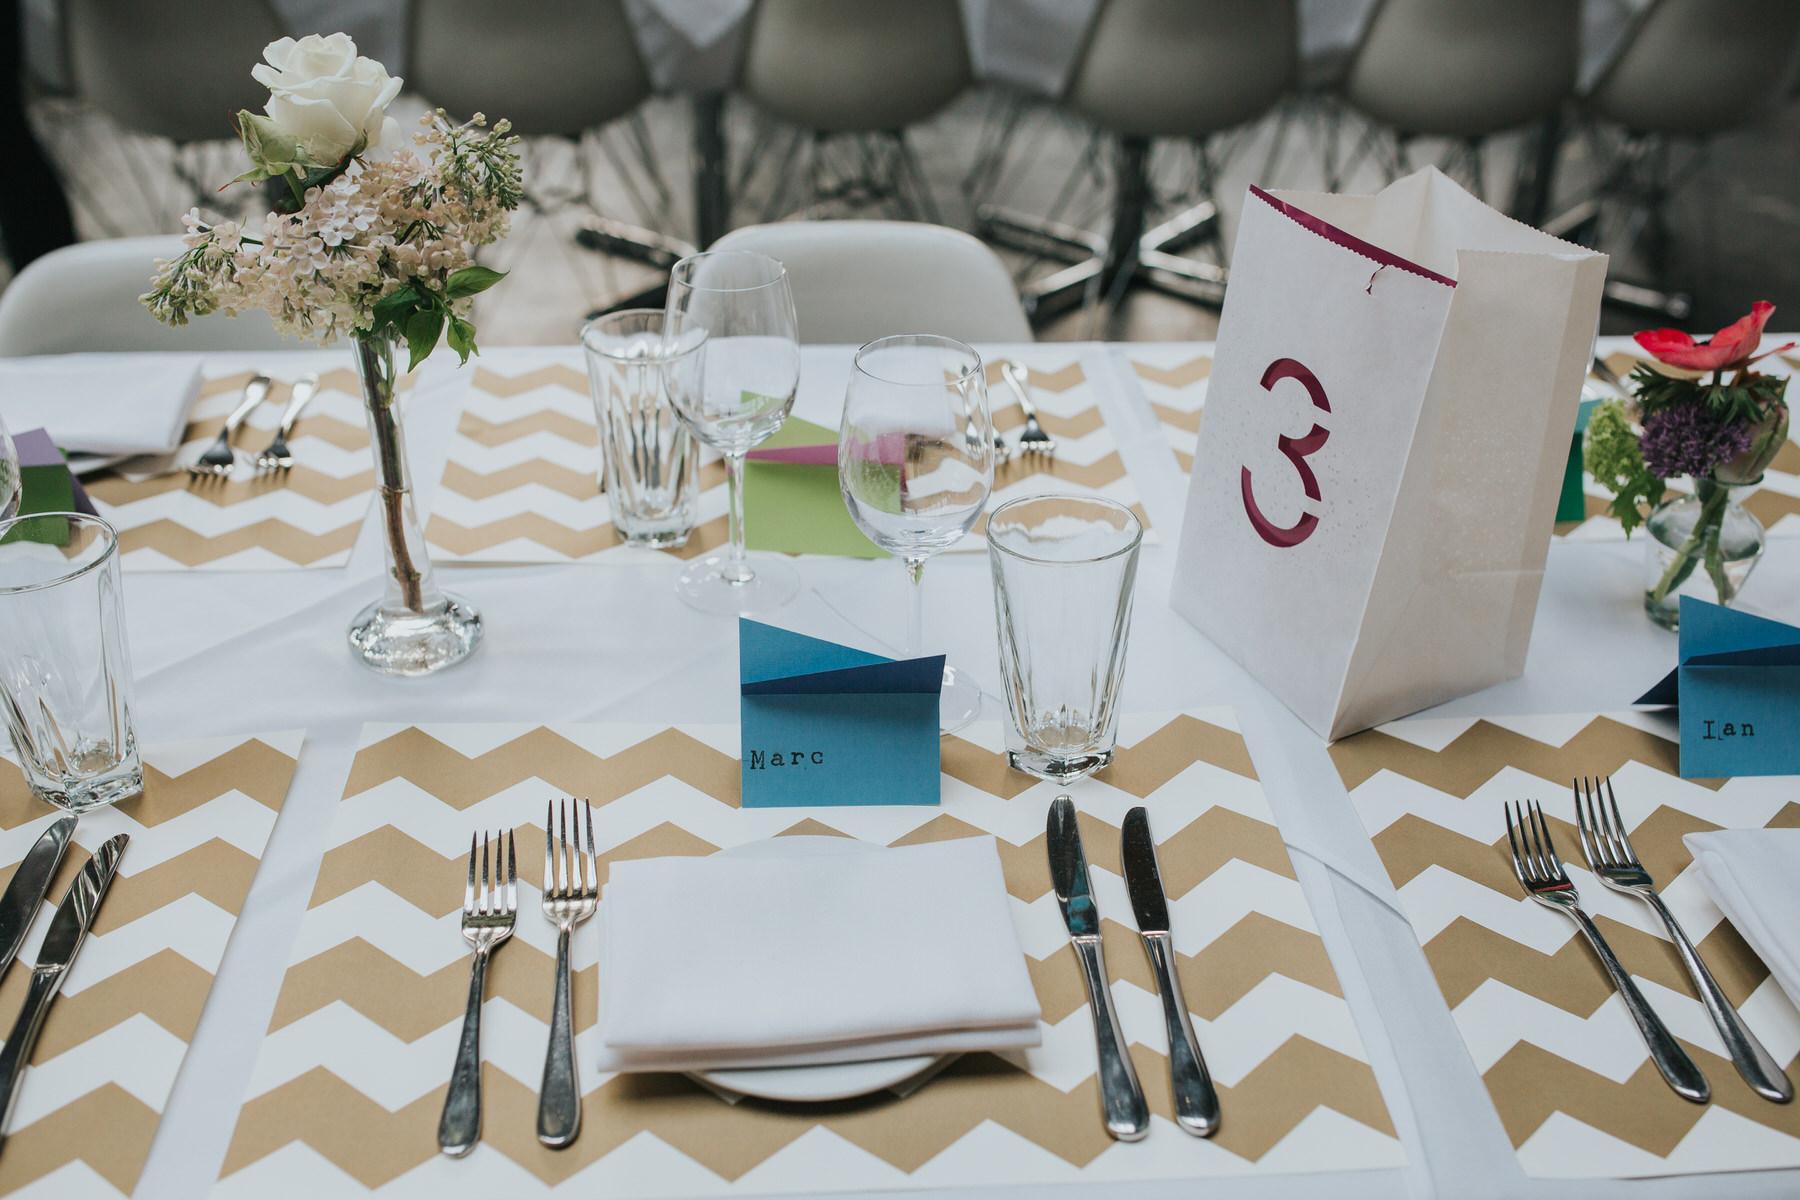 27-St Chads Place wedding gold chevron table mulit colour geometric place names.jpg